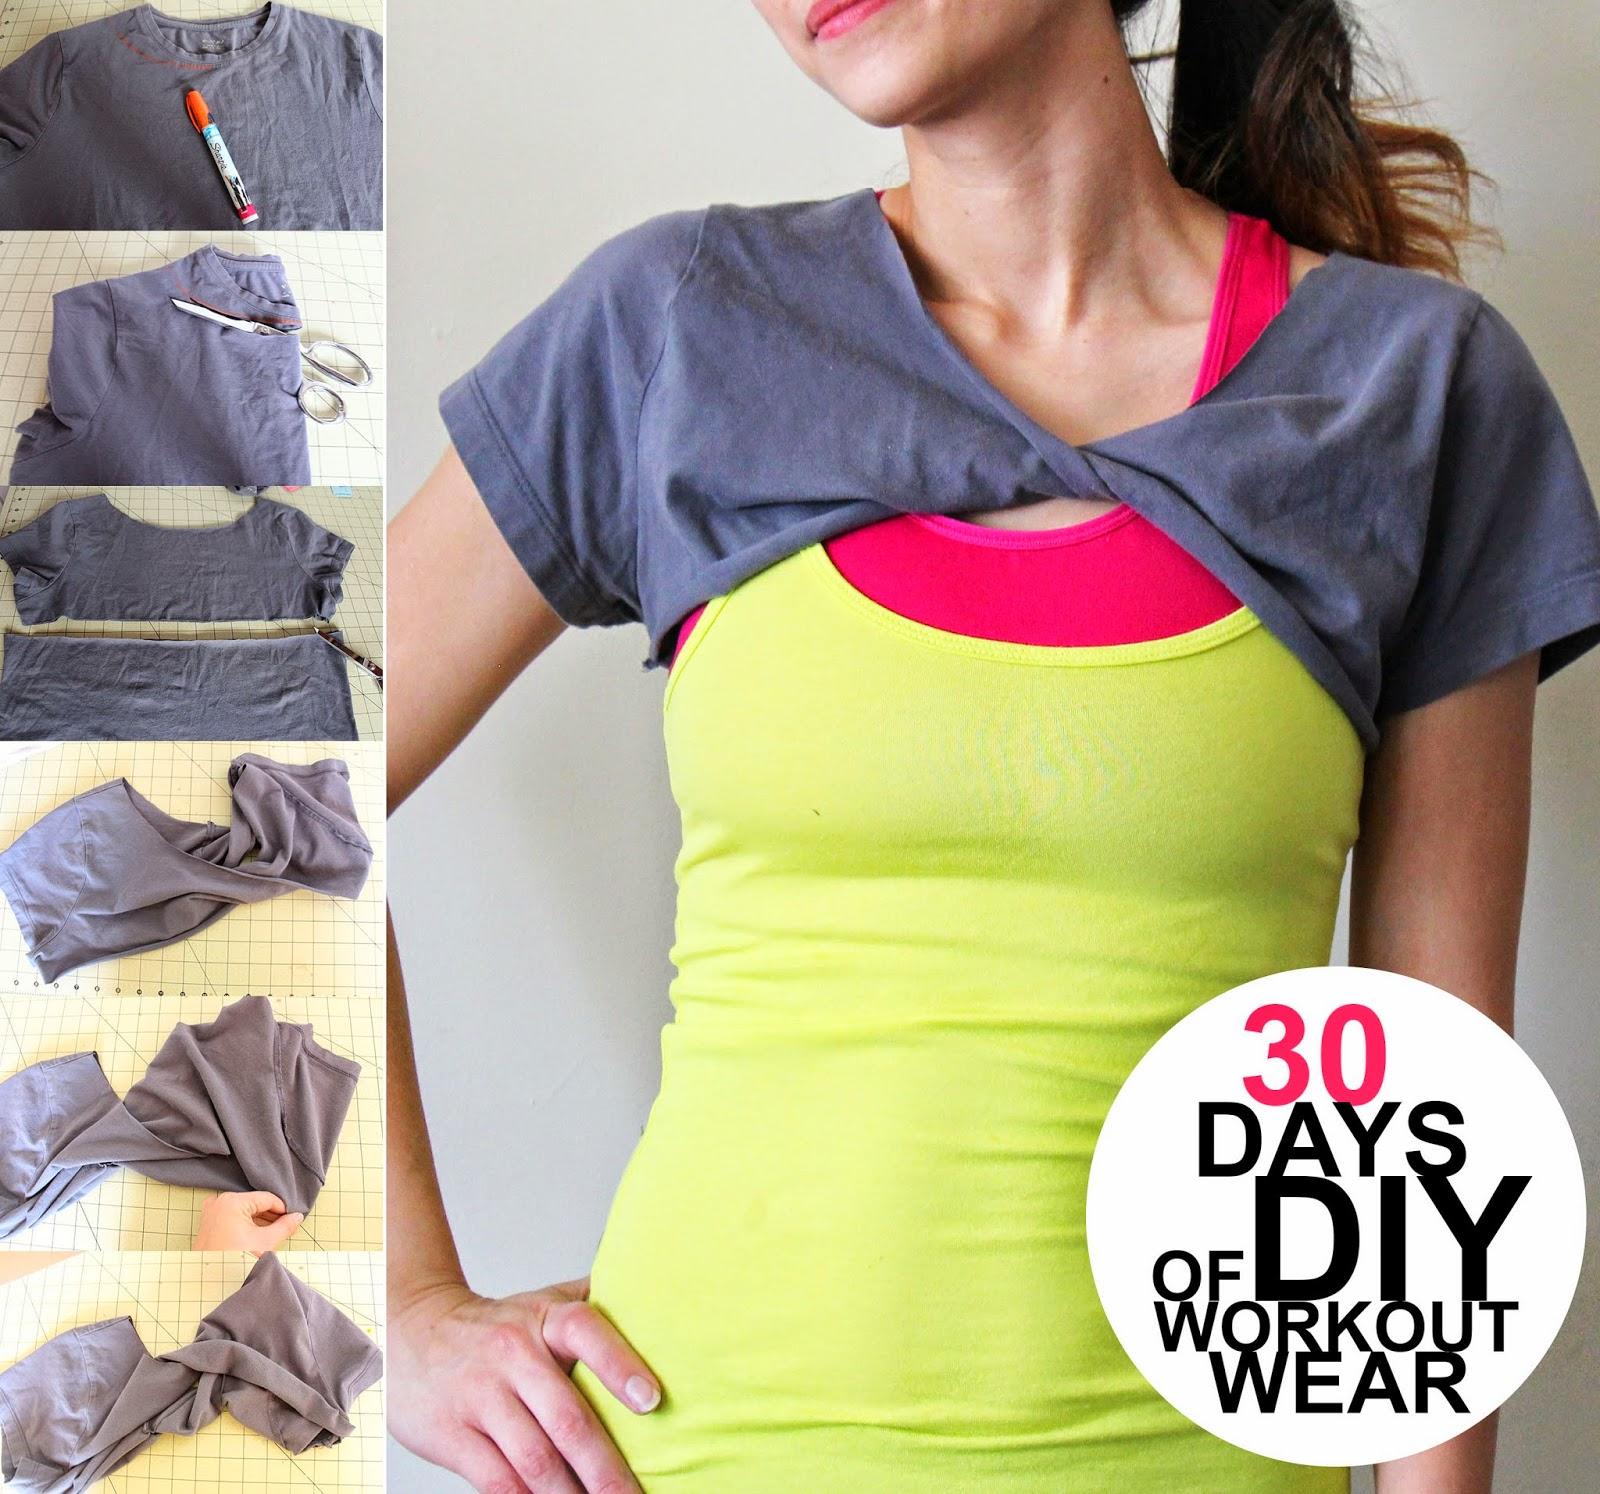 Grosgrain: 30 Days of DIY Workout Wear: Day 4